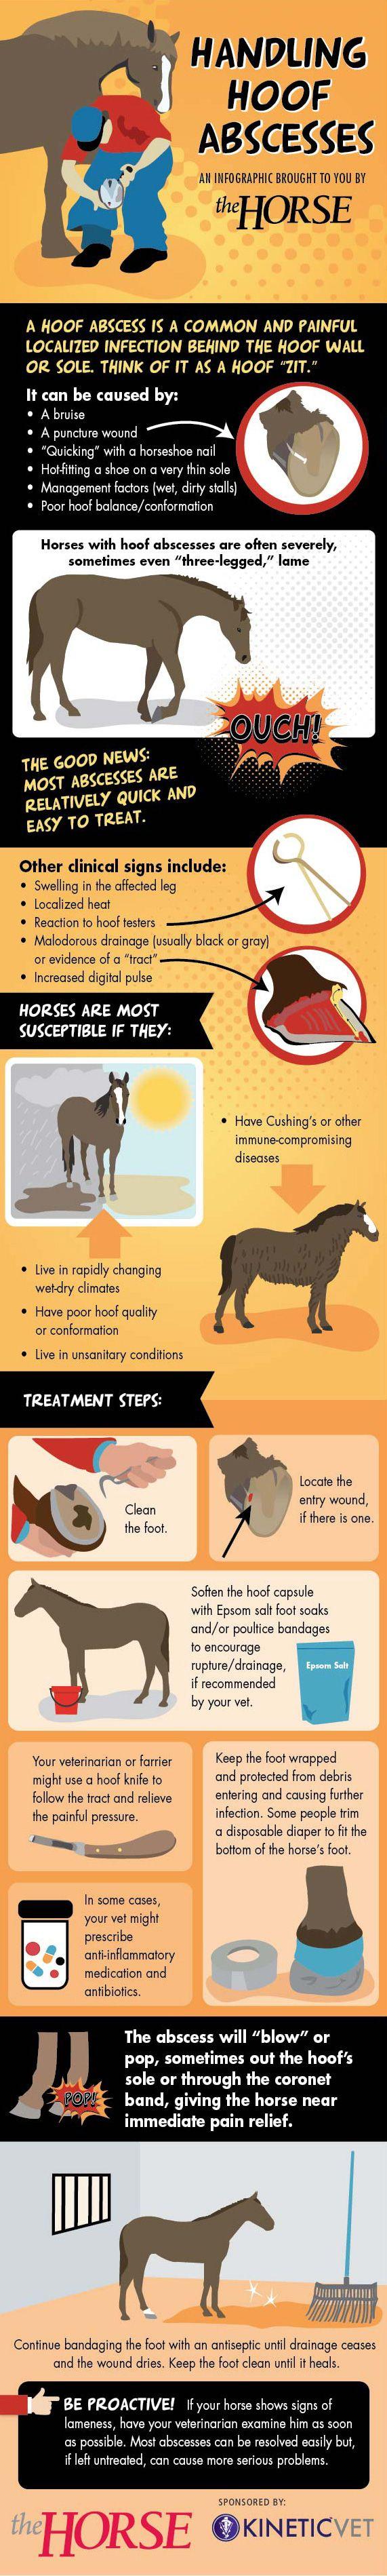 Equine Veterinary Nurse Sample Resume 188 Best Vet Tech Images On Pinterest  Veterinary Medicine Anatomy .